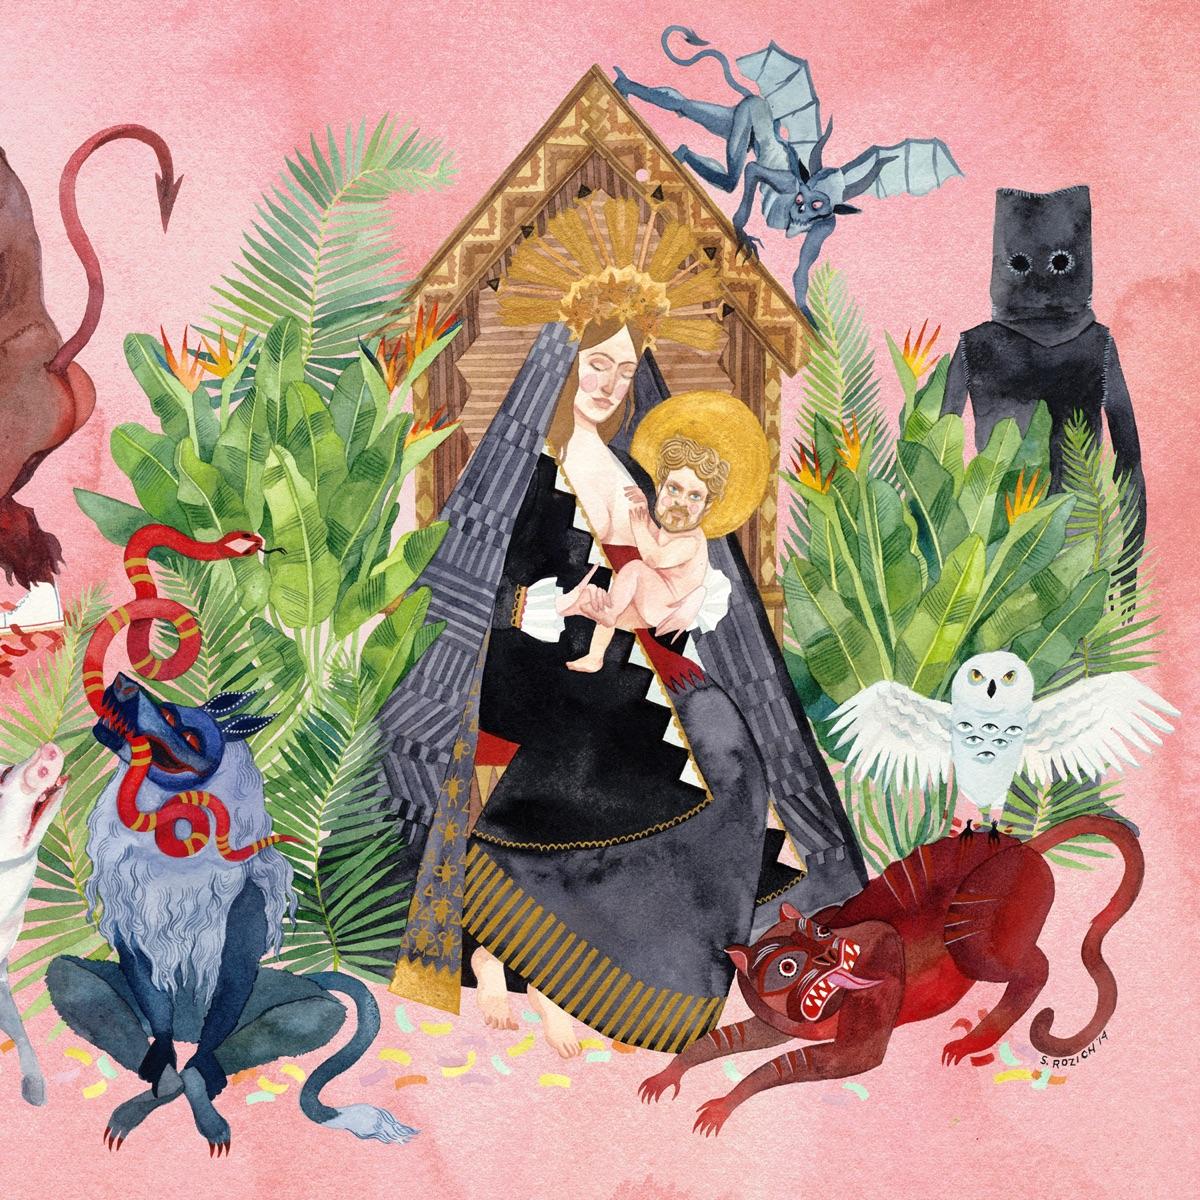 I Love You Honeybear Father John Misty CD cover